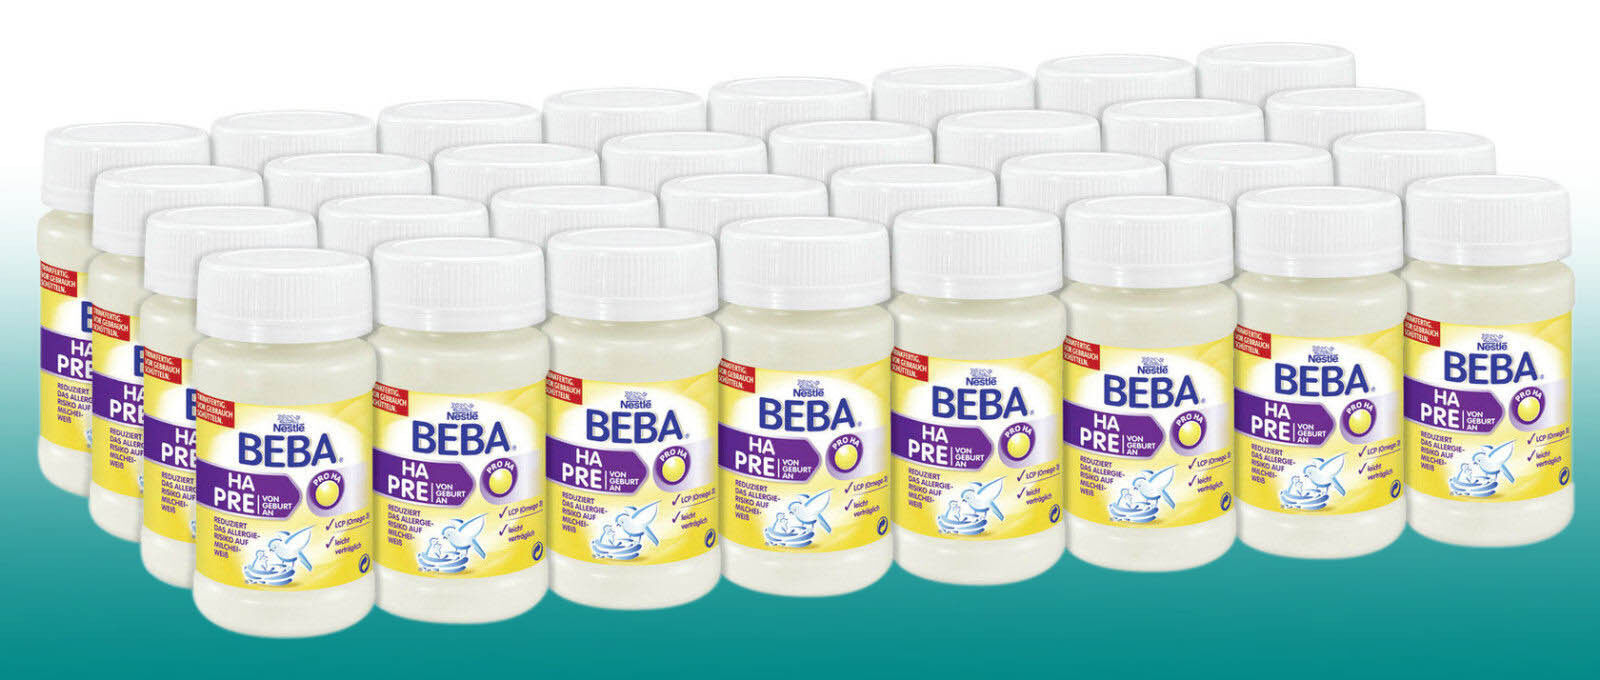 (12,15 €/Liter) Nestlé Beba HA PRE TRINKFERTIG Babynahrung 32x90ml  Baby